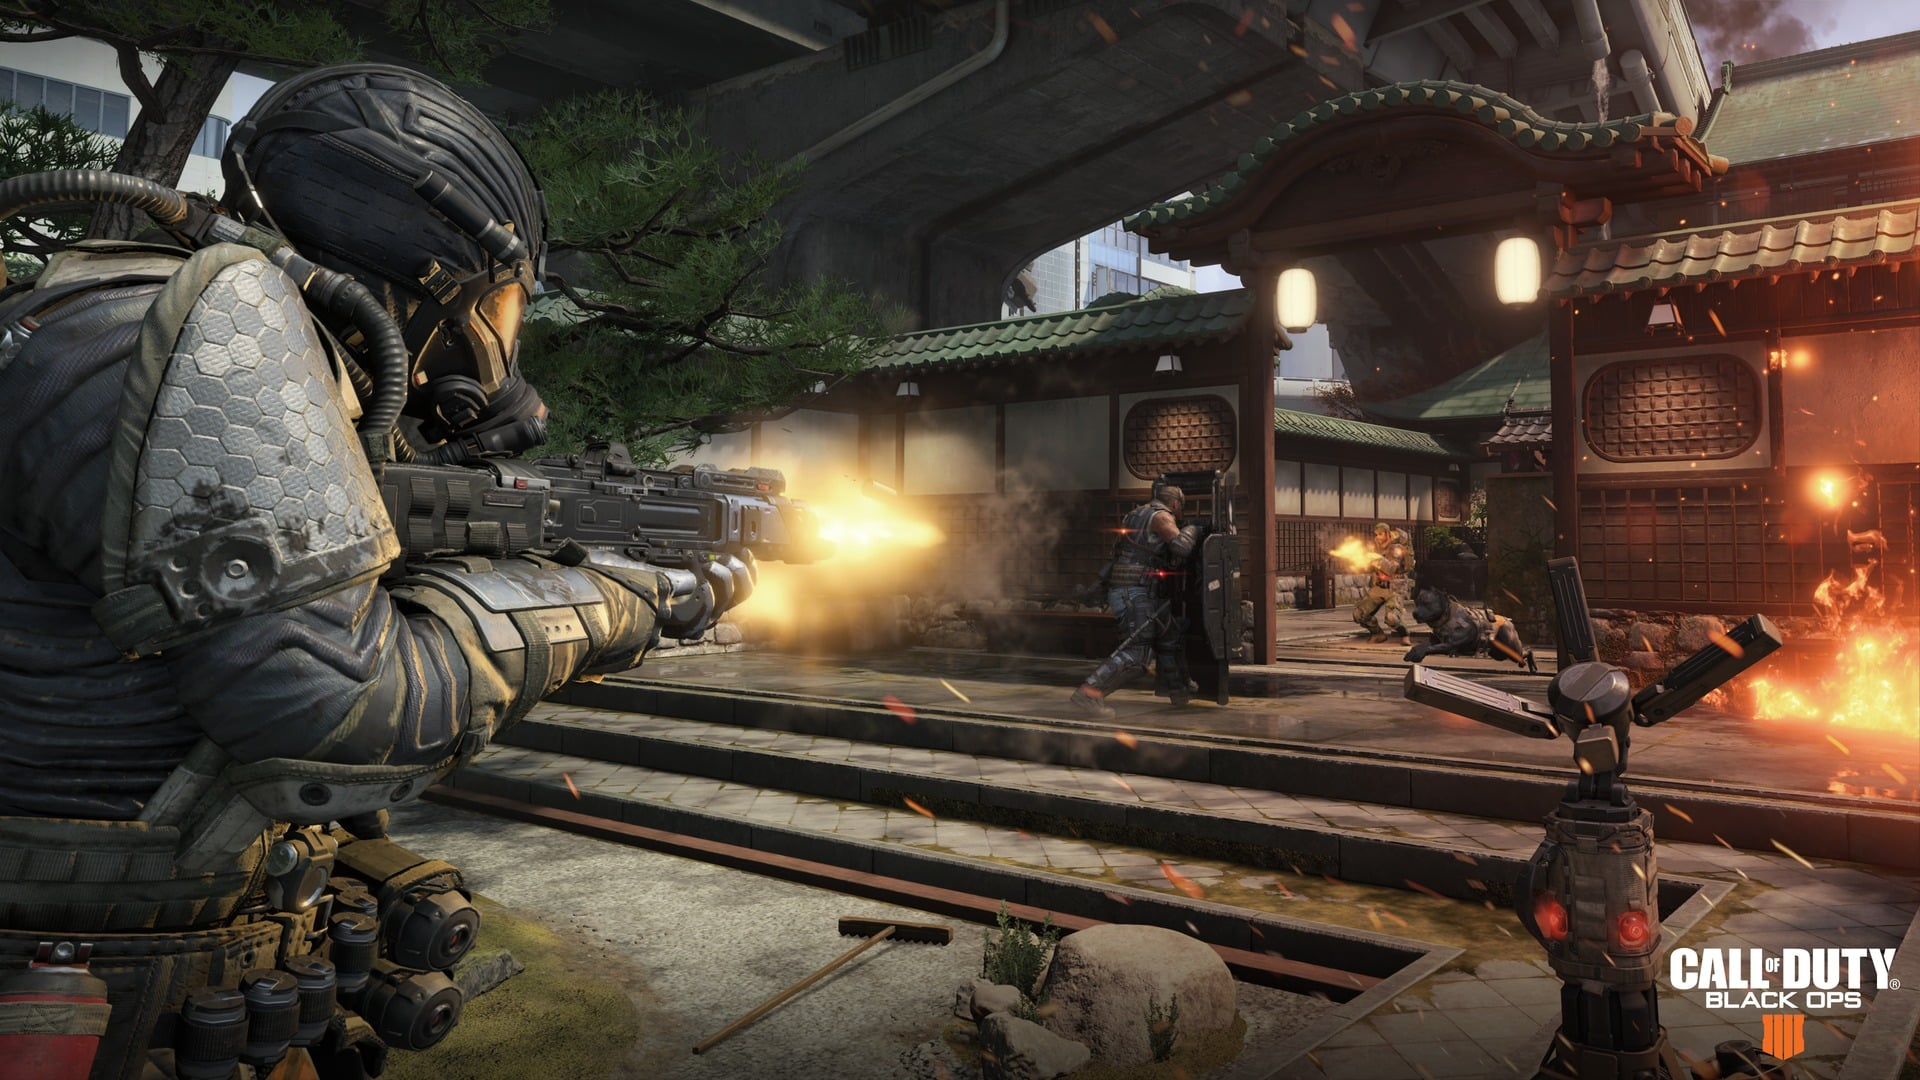 Call of Duty Black Ops 4 Screenshots